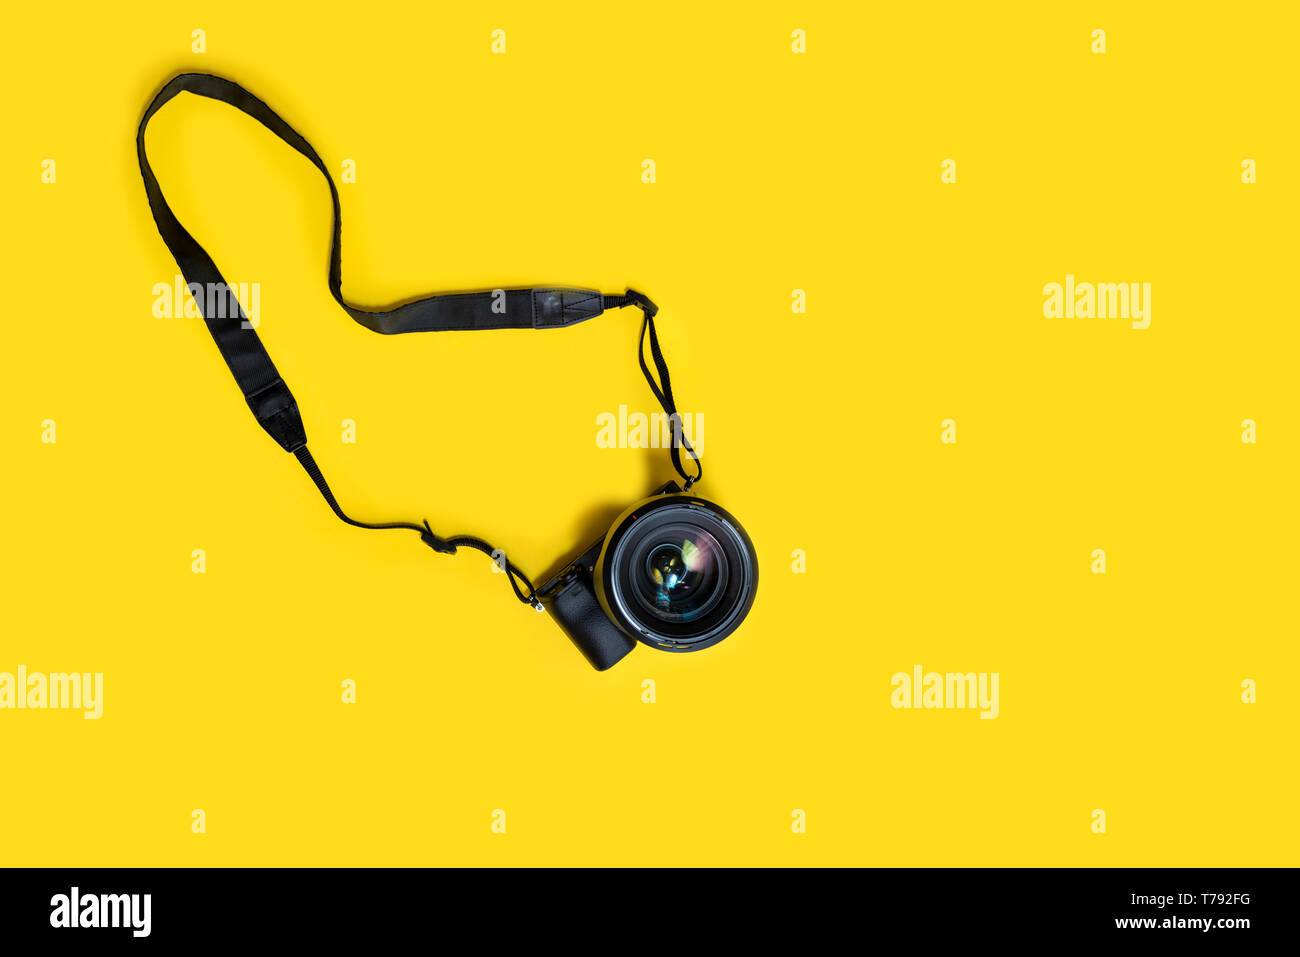 Mirrorless black camera on yellow background, summer memmories photograher - Stock Image